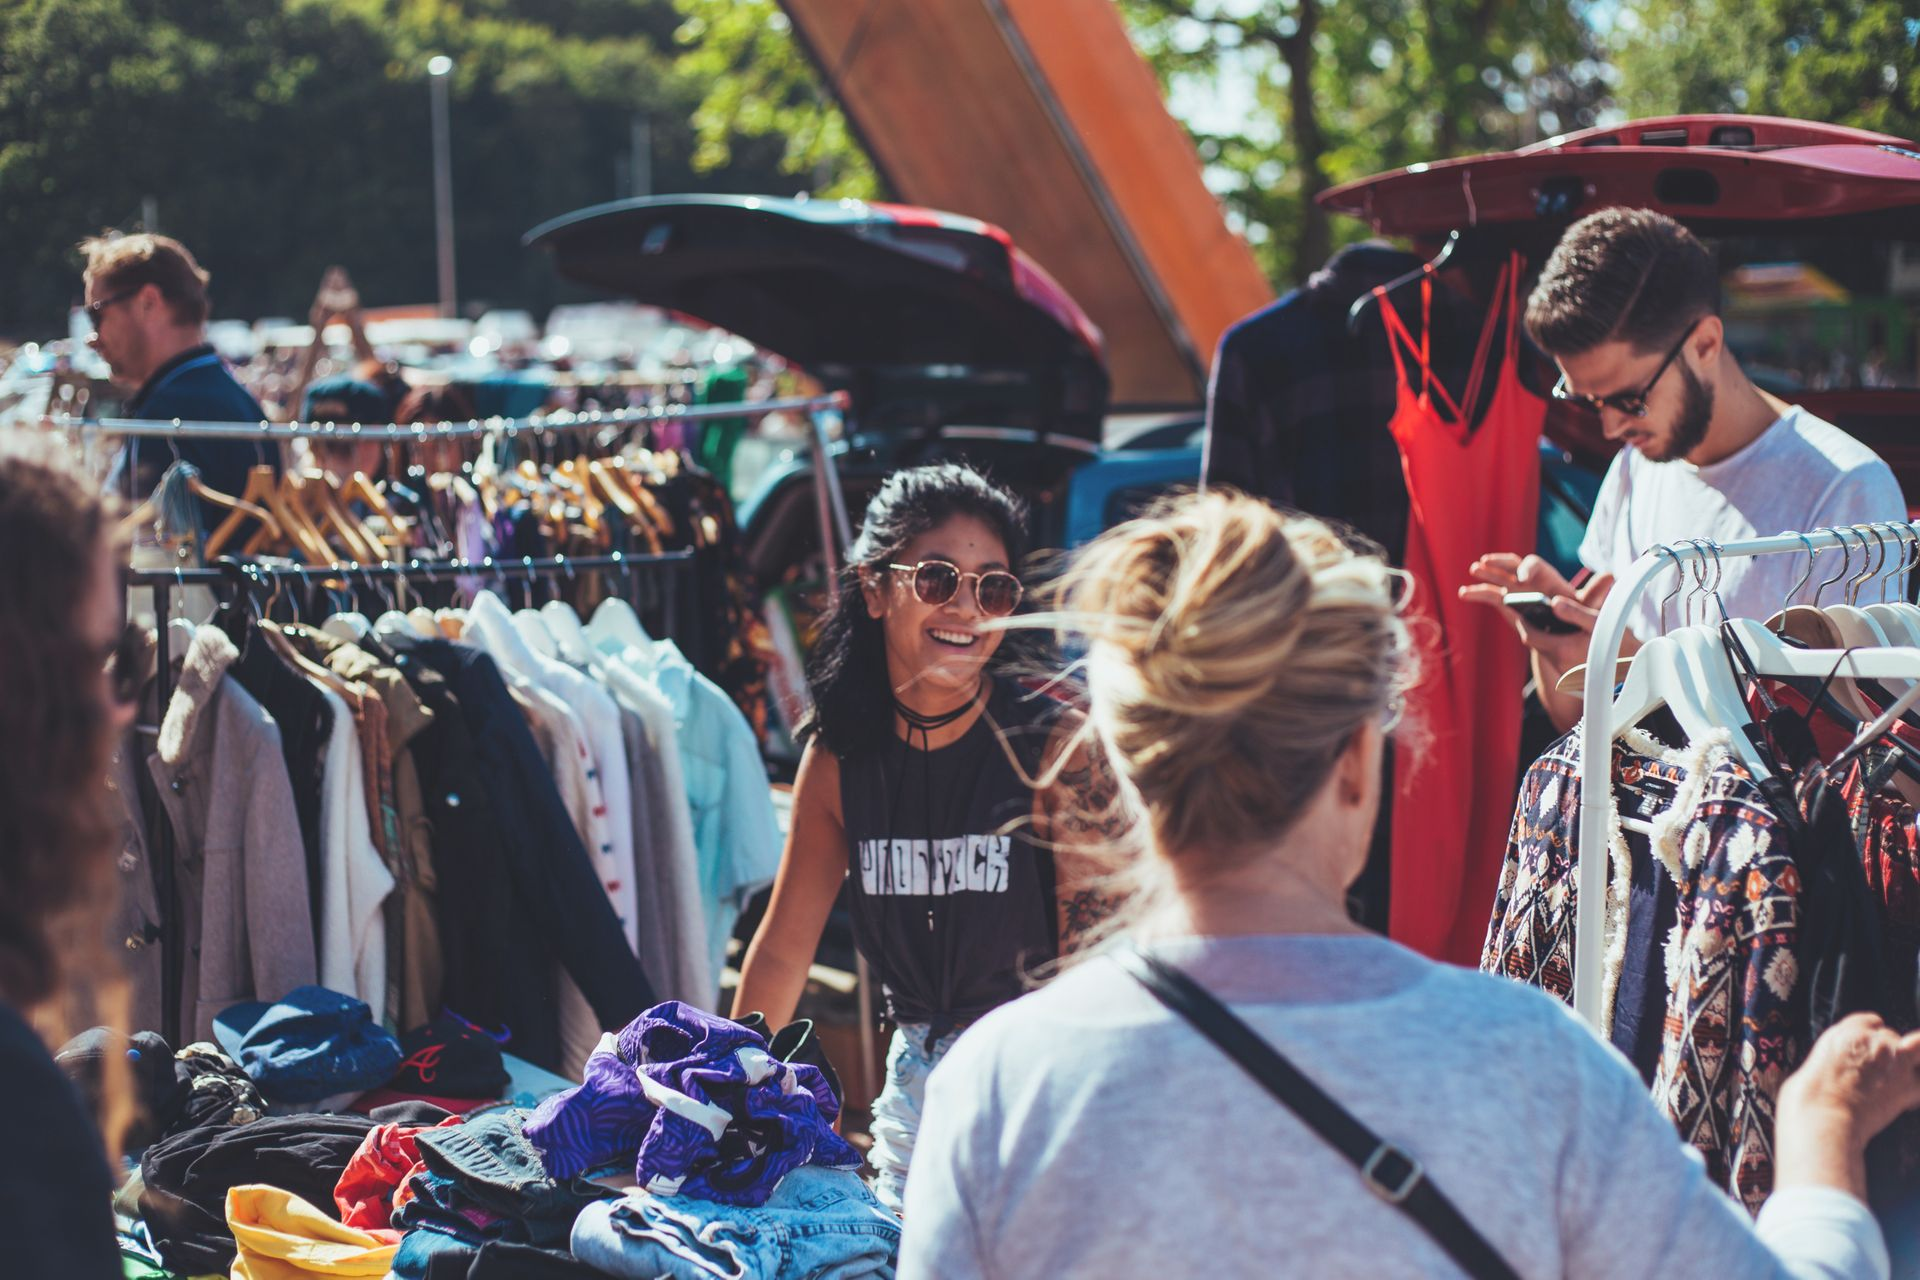 People browsing through racks of clothing at outdoor flea market